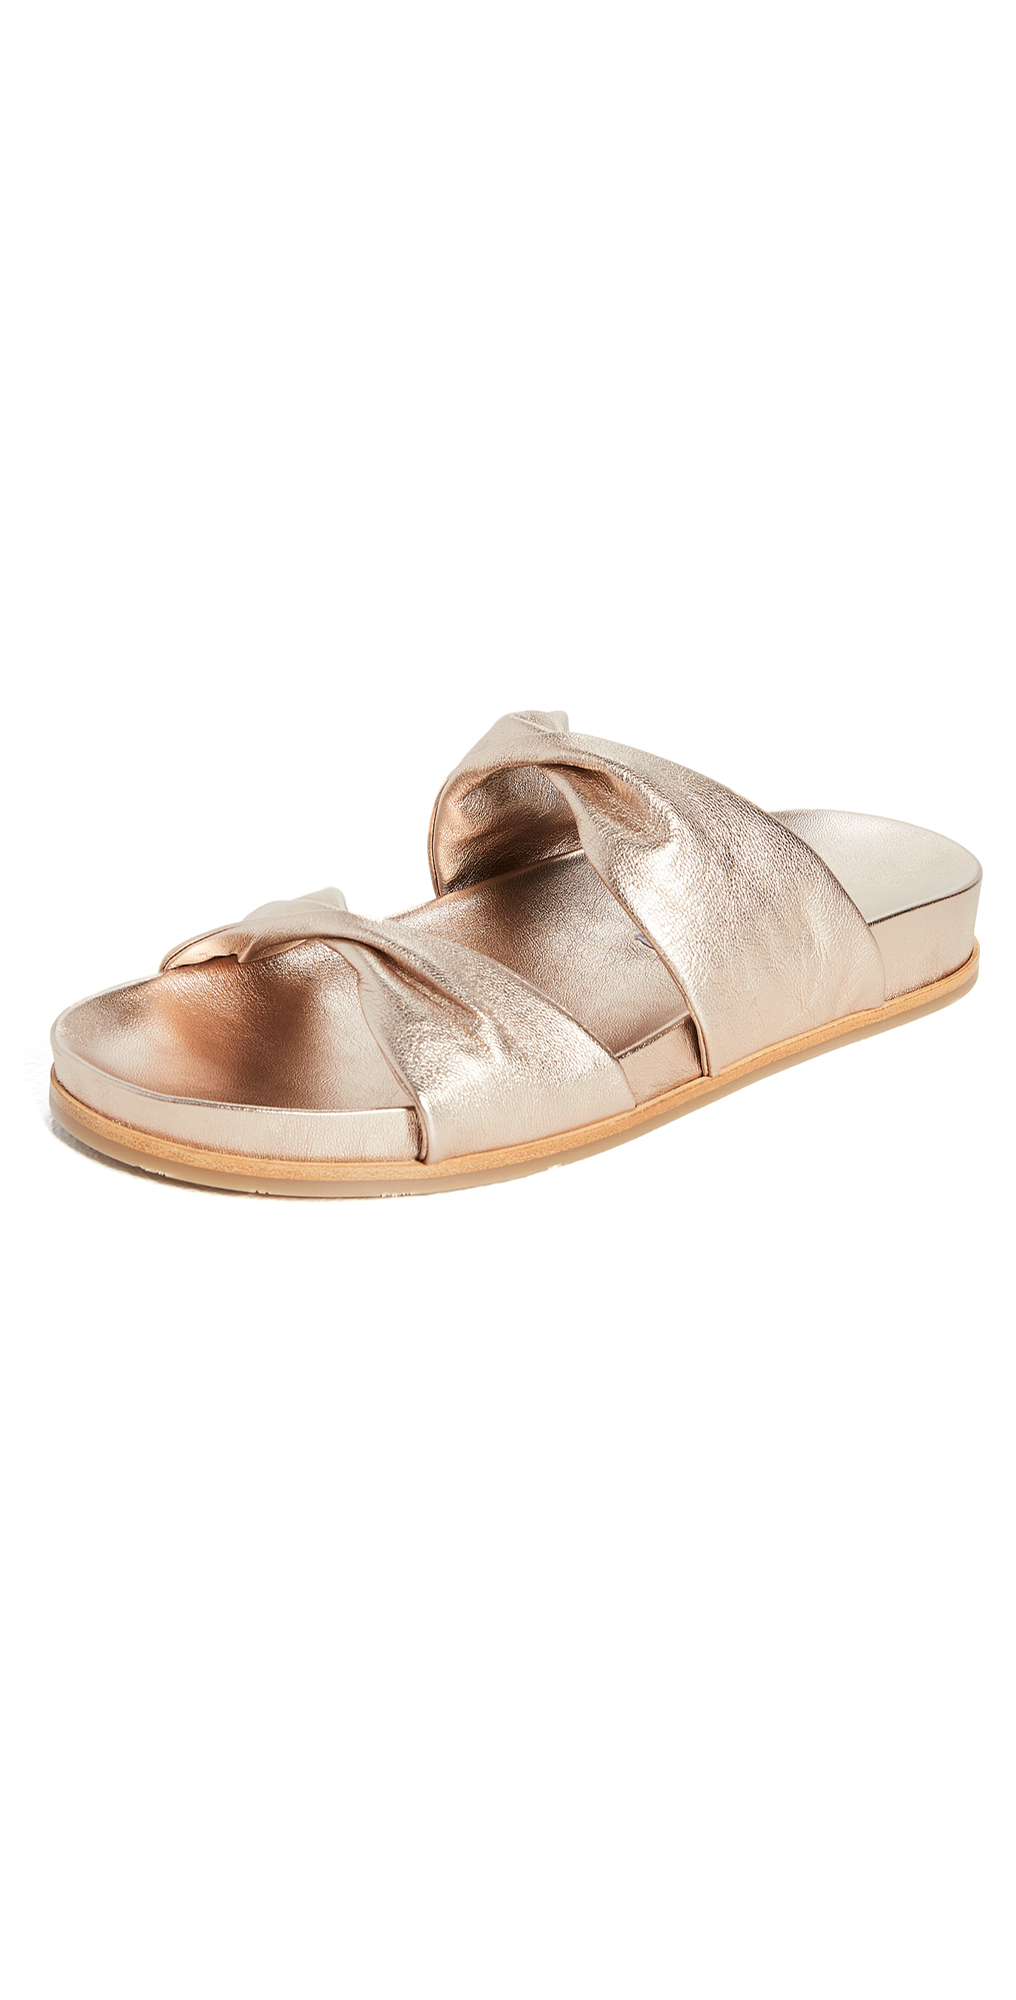 Aquazzura Twist Sandals